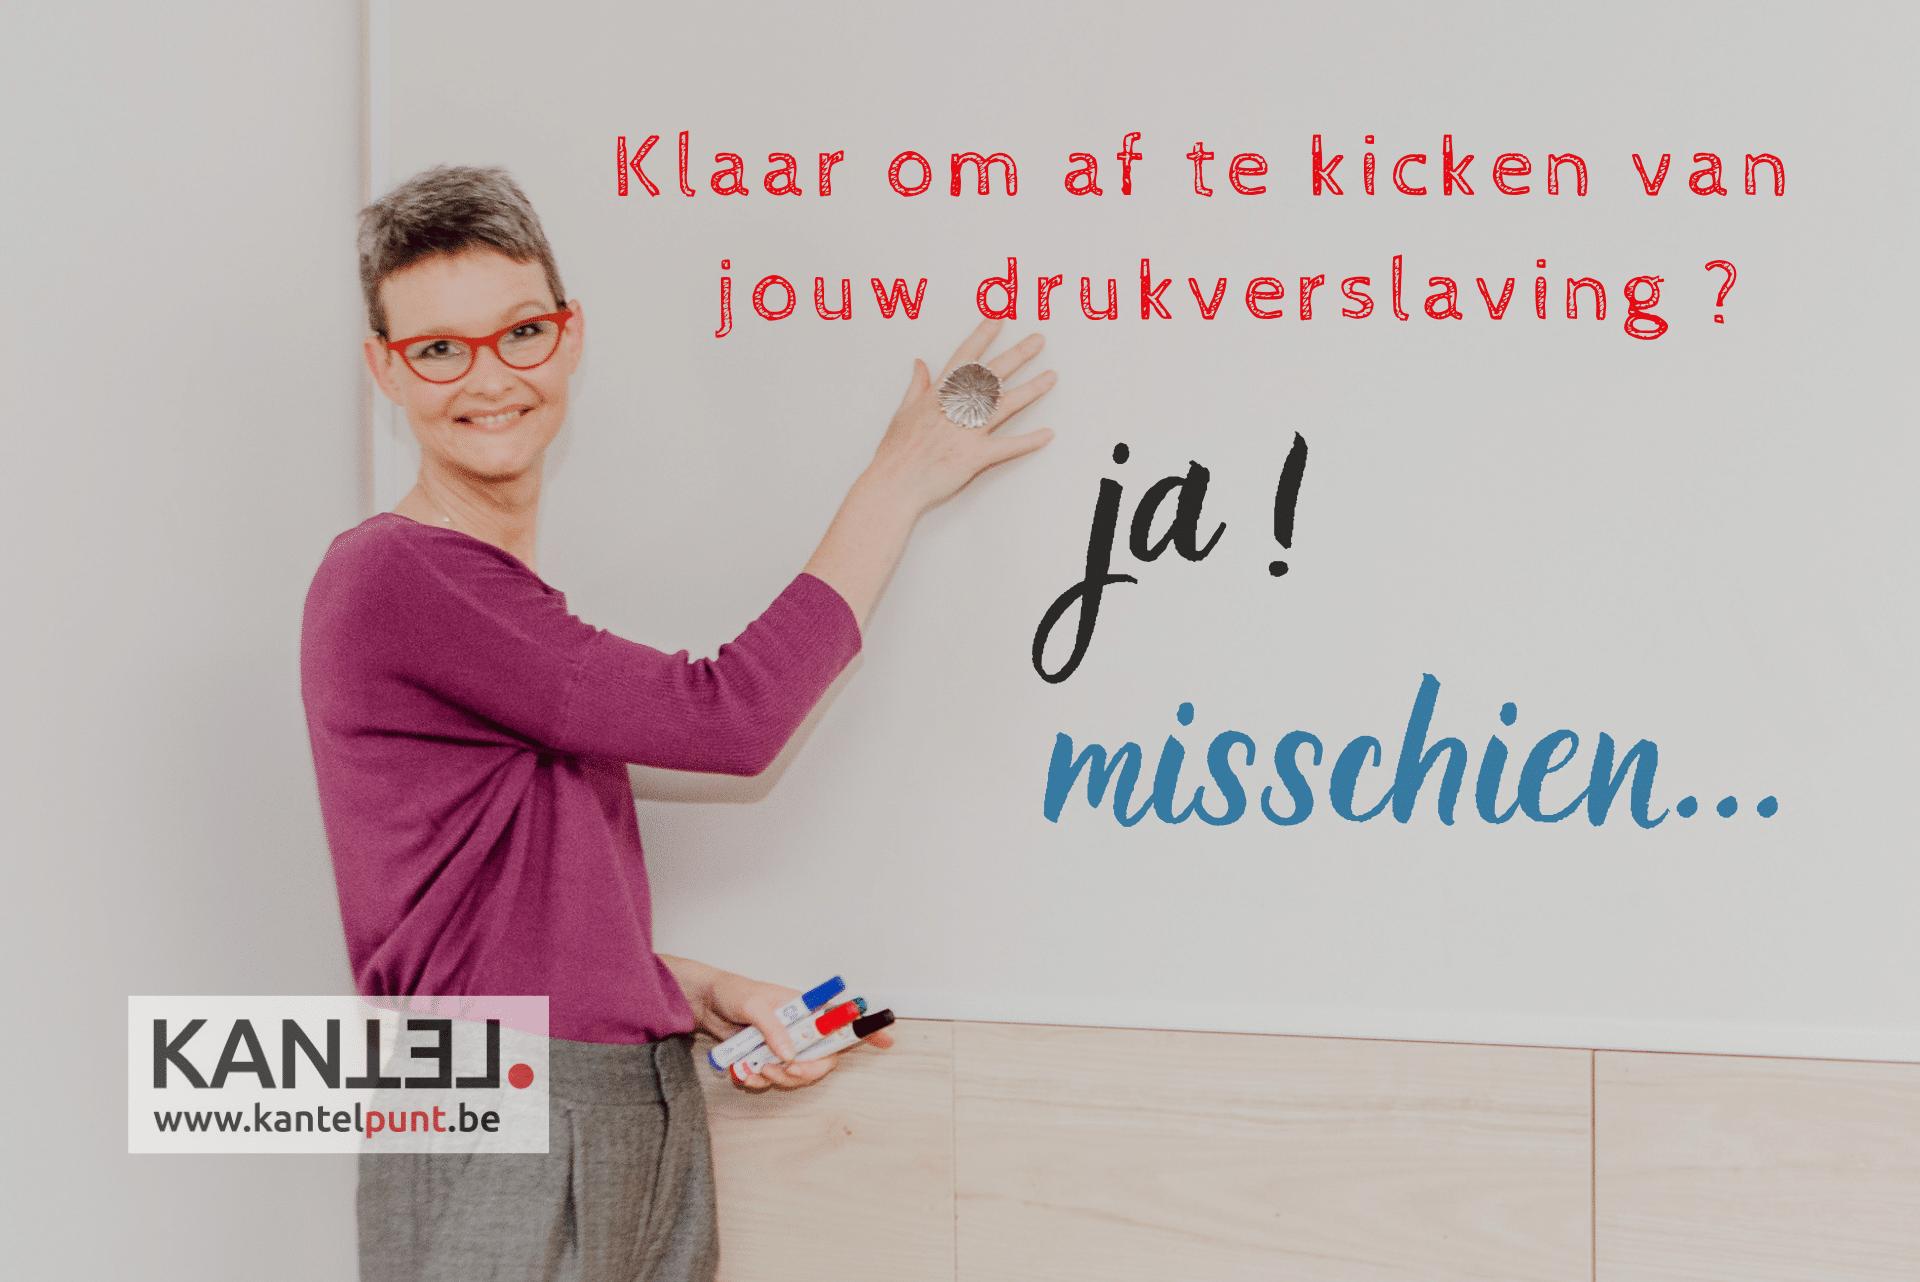 https://www.kantel.be/afkicken-van-drukverslaving/